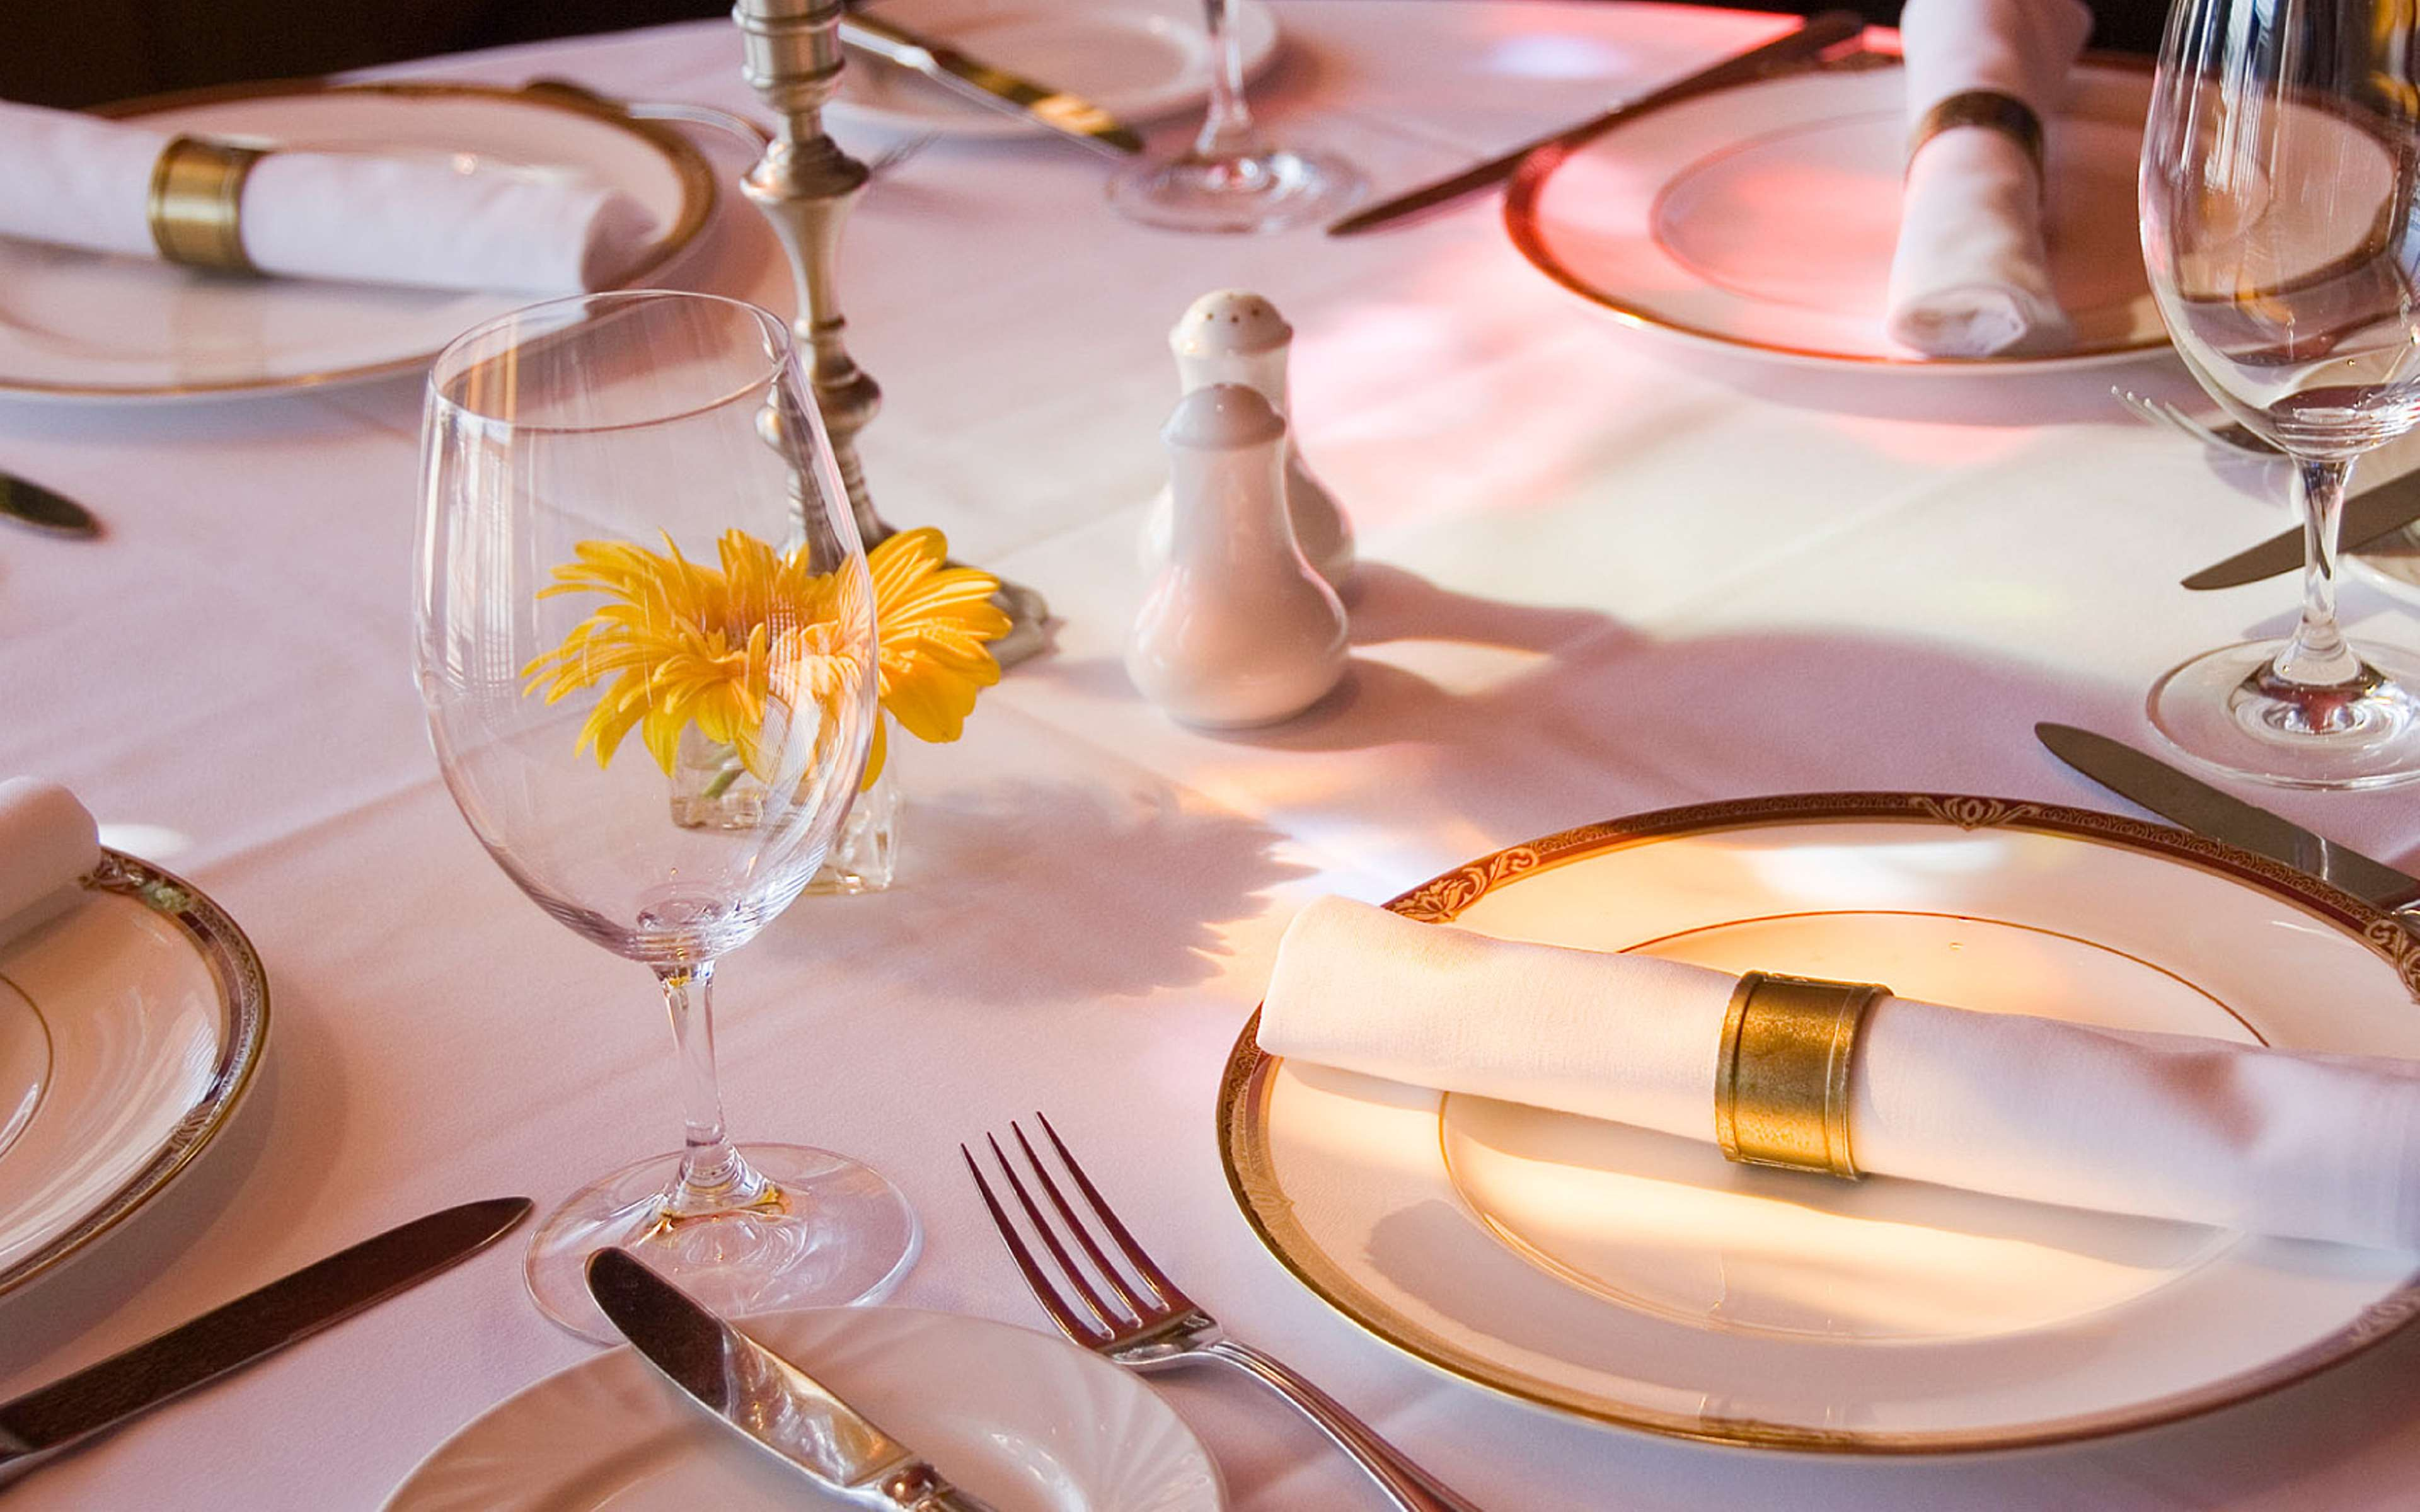 Best Western Premier Hotel Aristocrate à Quebec: Dining